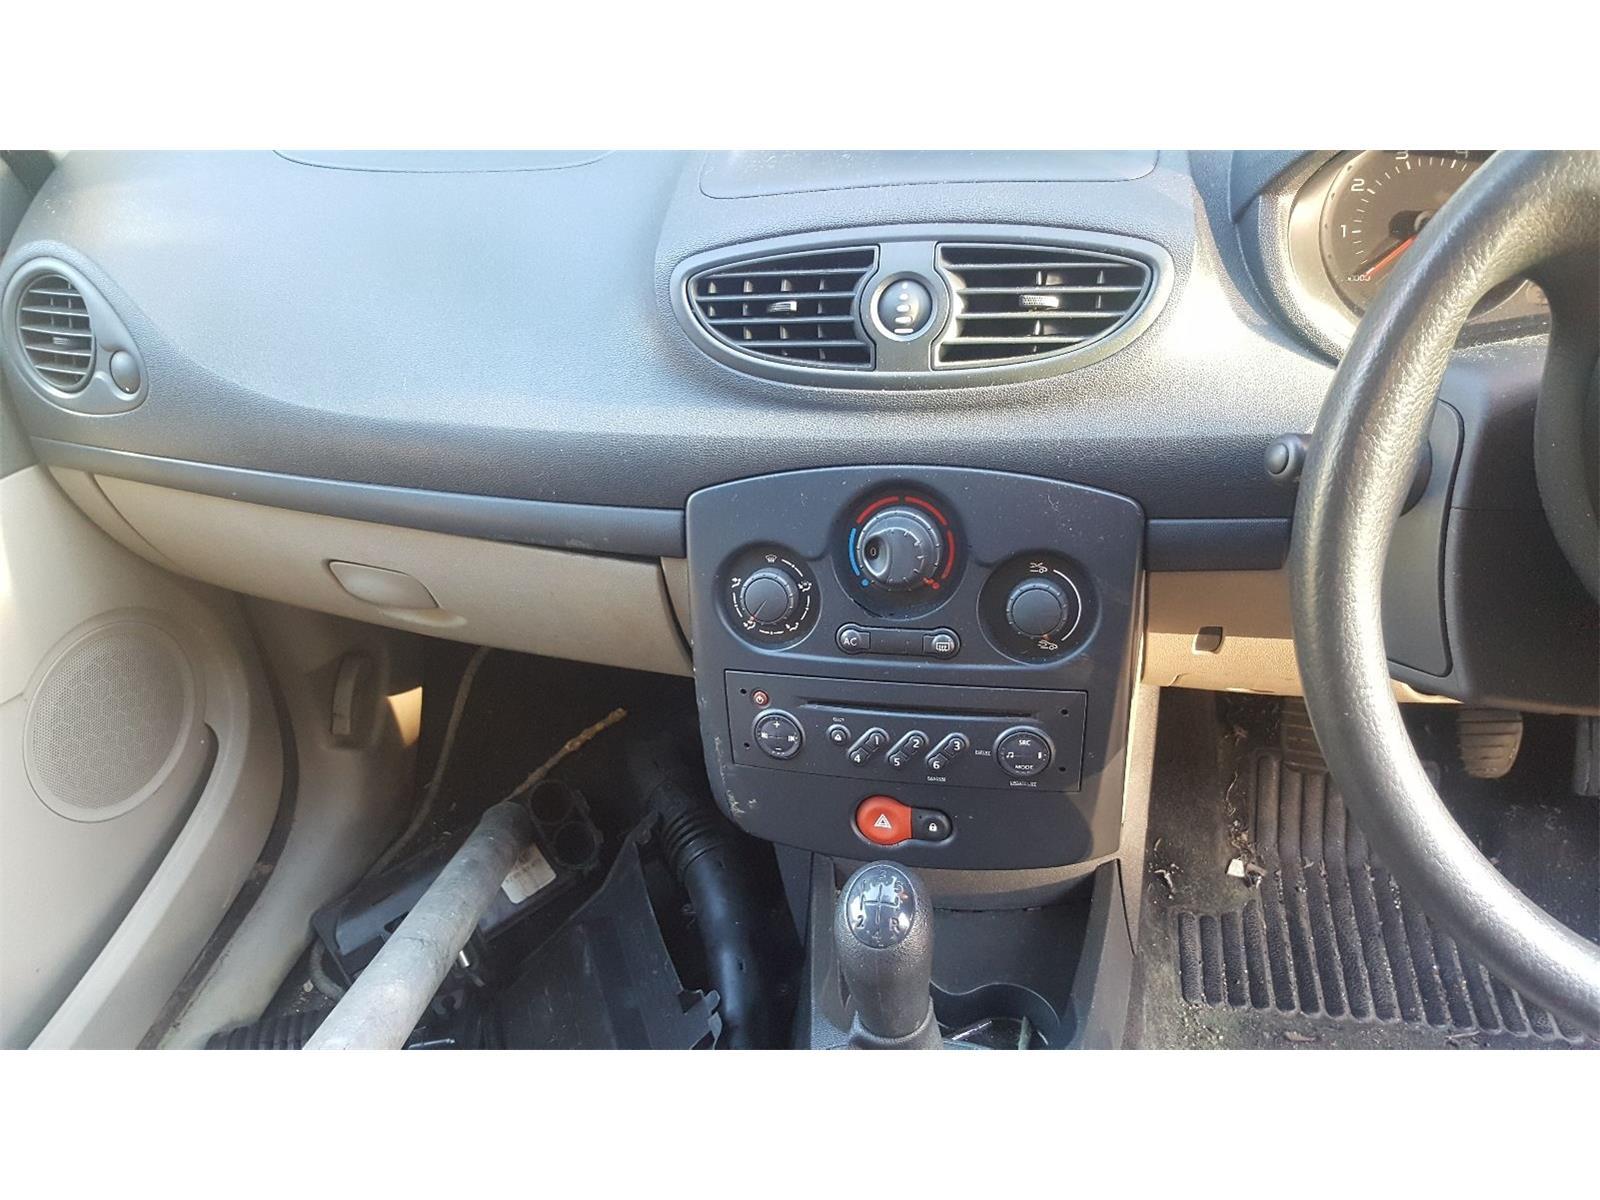 Renault Clio 2006 To 2009 Expression 5 Door Hatchback / scrap / salvage car  for sale / auction | Silverlake Autoparts